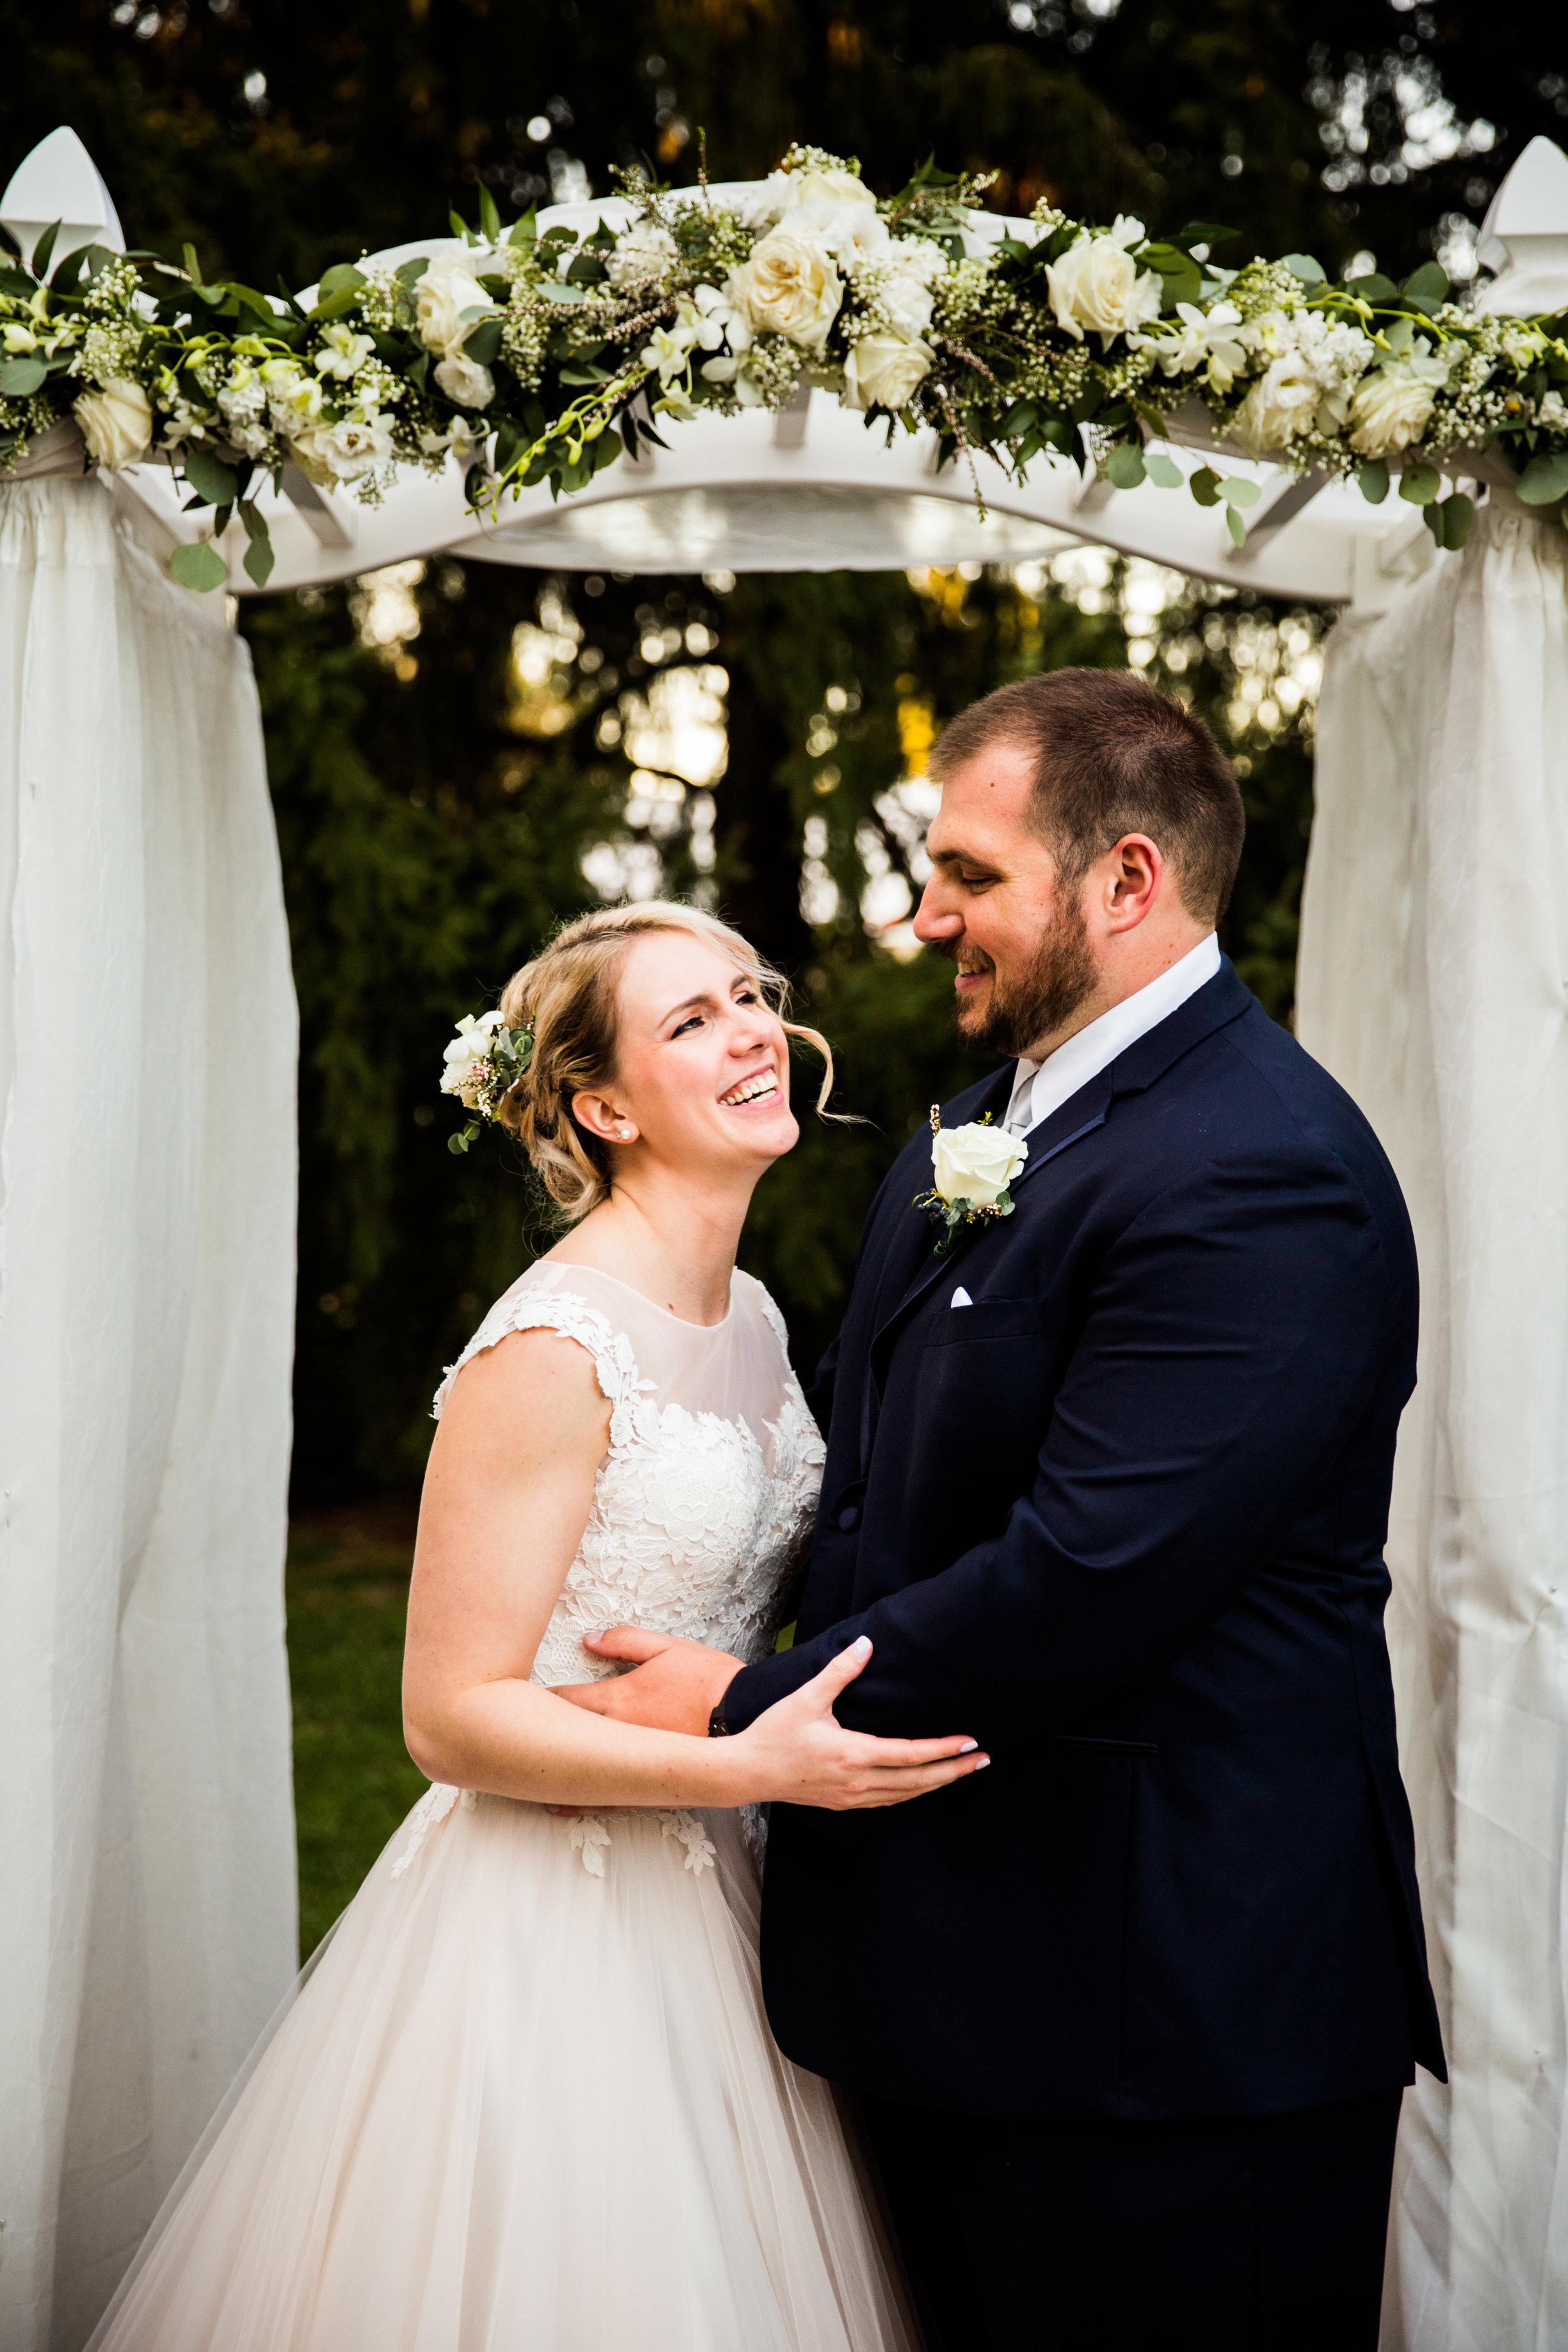 LA LUNA BANQUET HALL WEDDING BENSALEM - 066.jpg